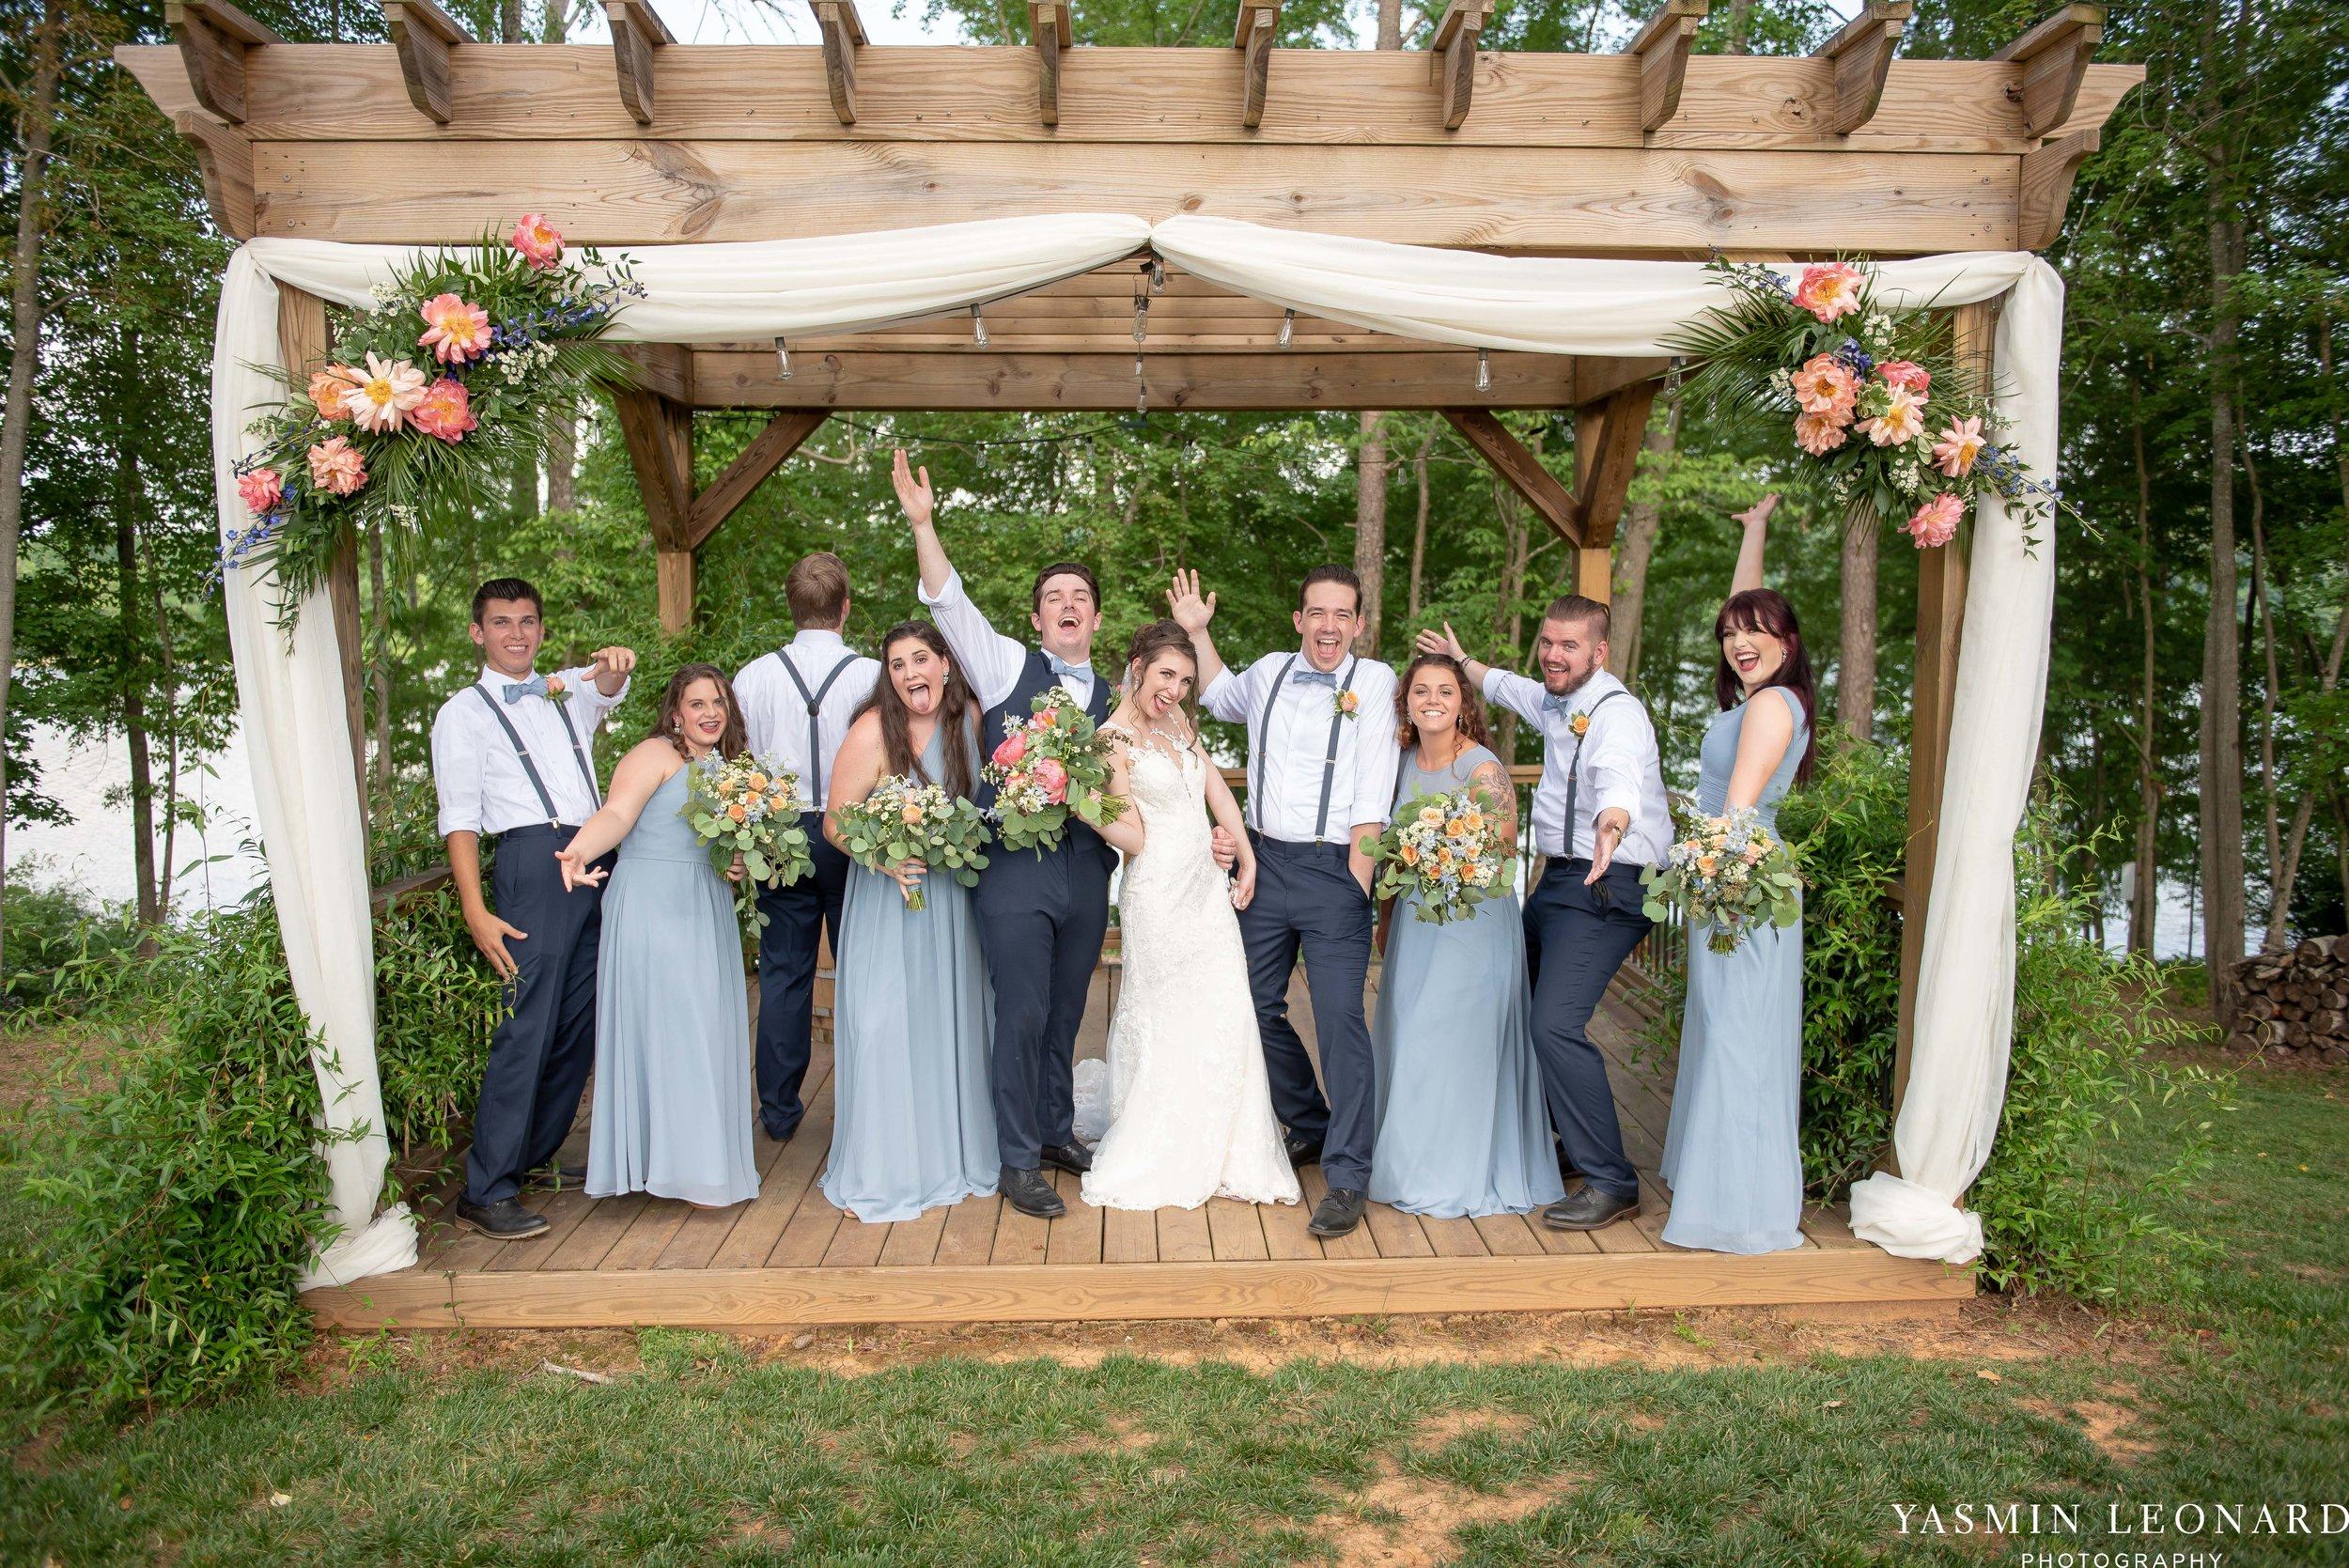 Old Homeplace Vineyard - NC Weddings - Outdoor Summer Weddings - Peony Boutique - Vineyard Wedding - NC Photographer - Yasmin Leonard Photography-36.jpg